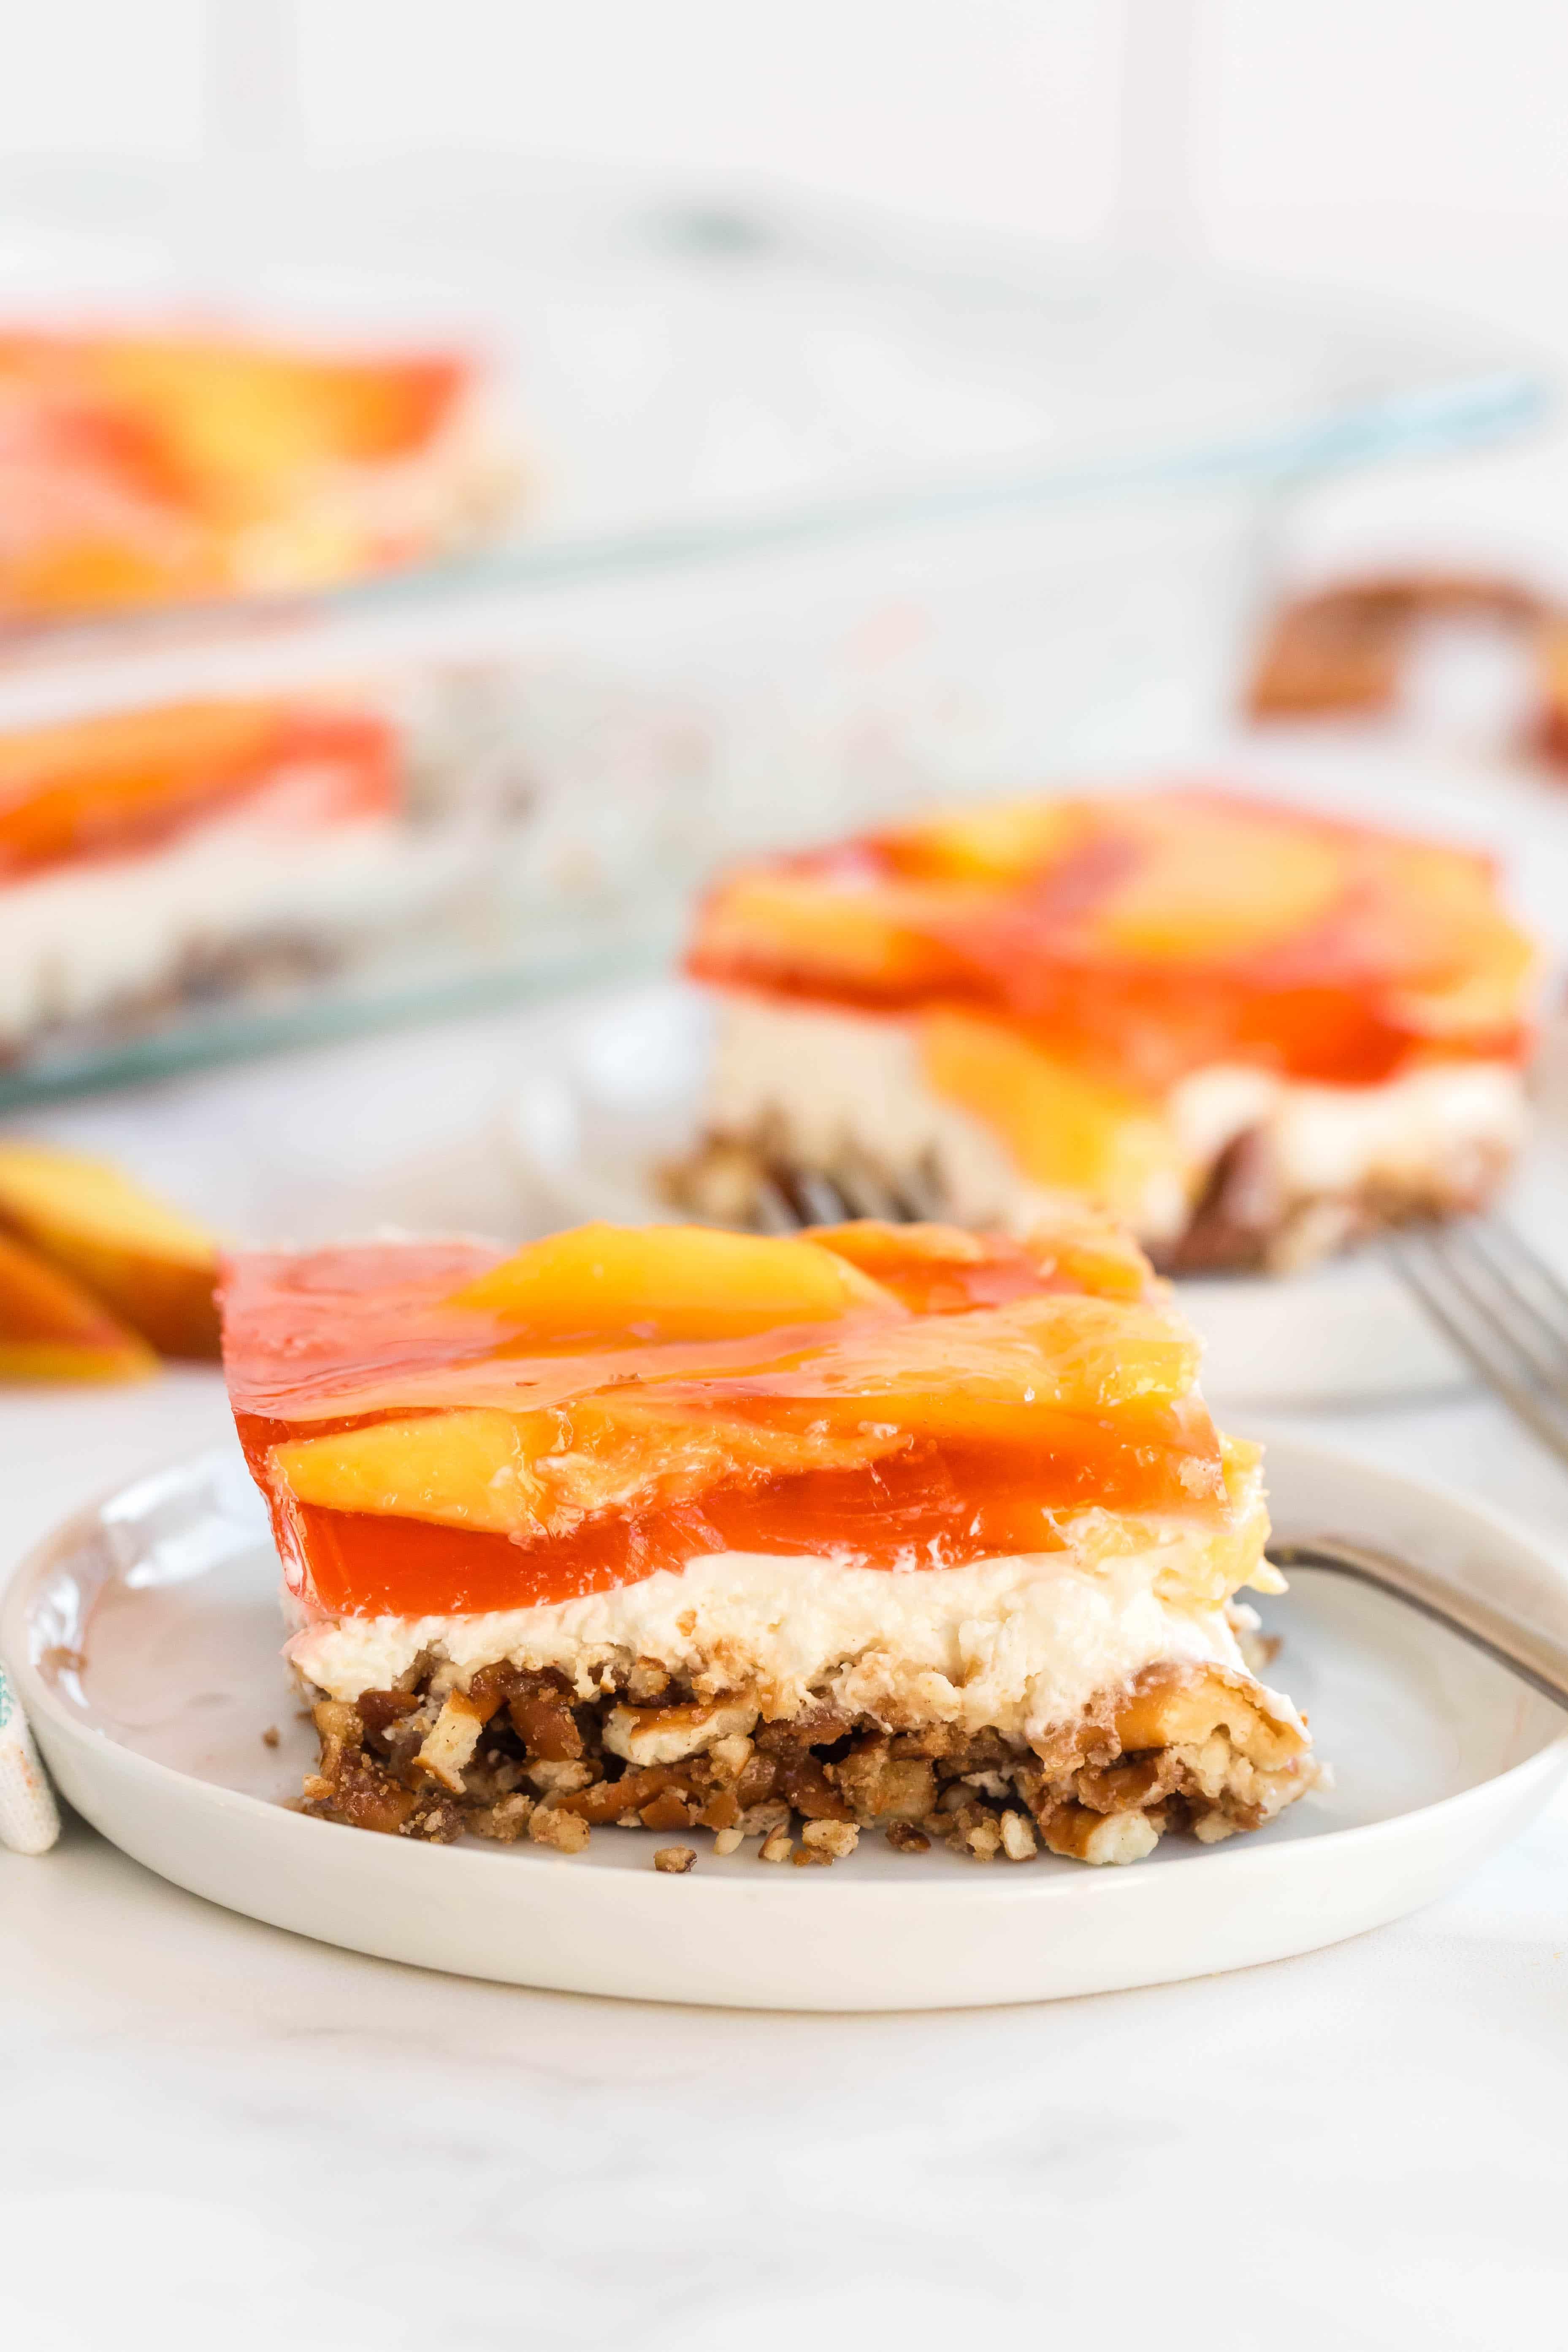 Serving of Peach Pretzel Jello Salad